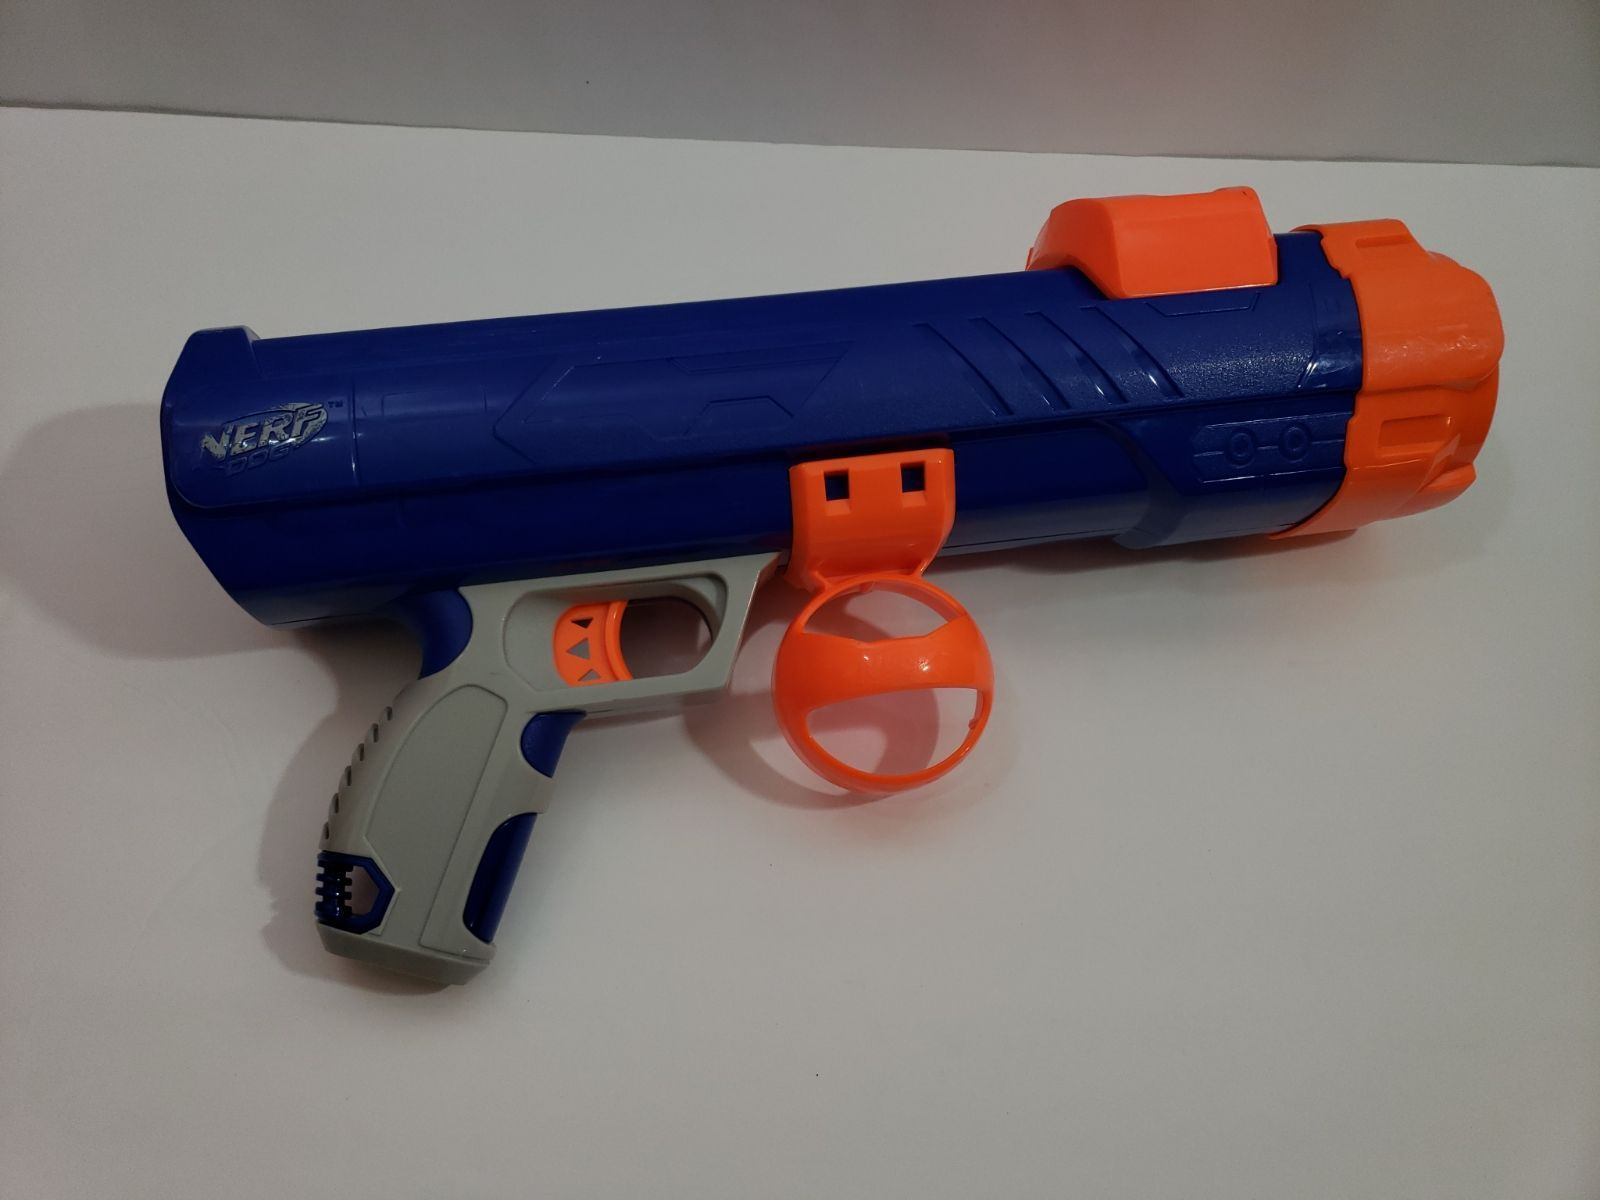 Pin On Nerf Nerf Blaster Guns